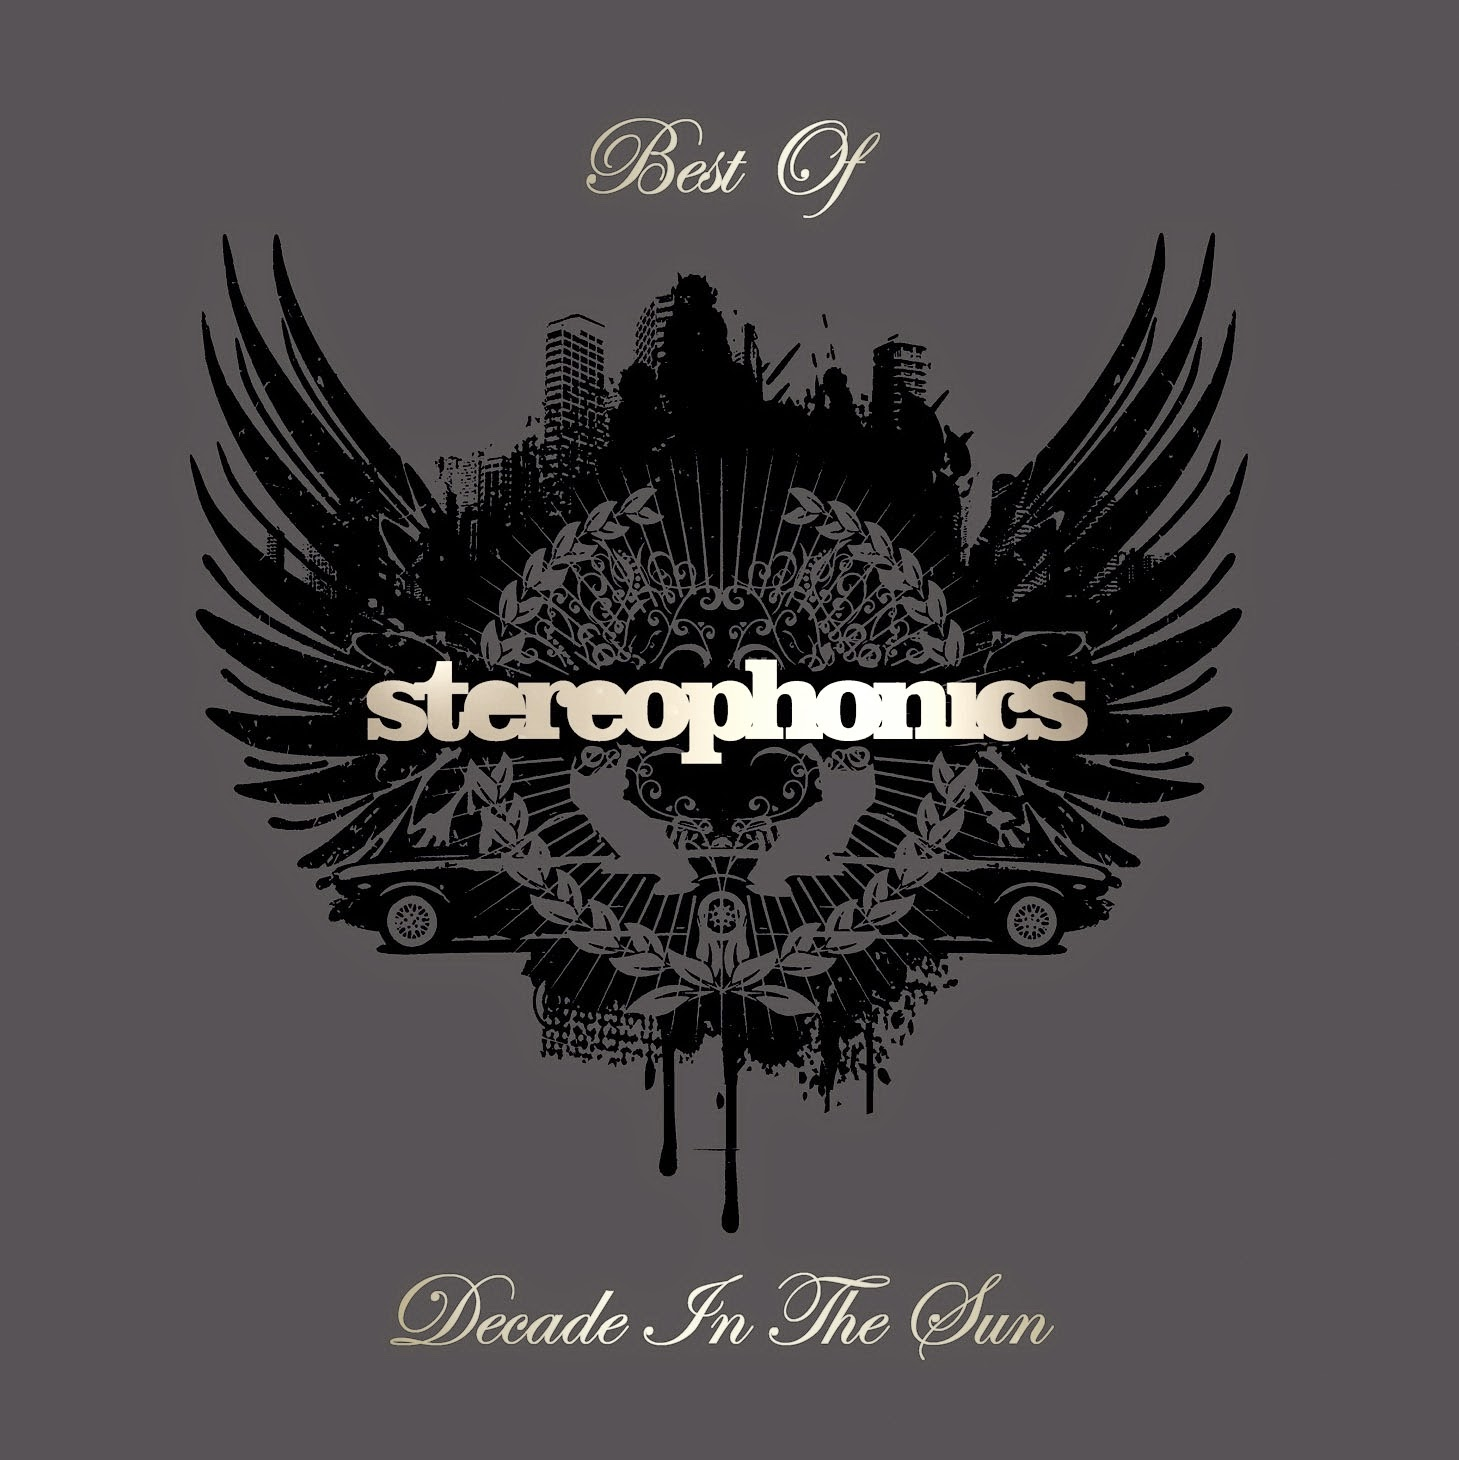 discografia de stereophonics gratis